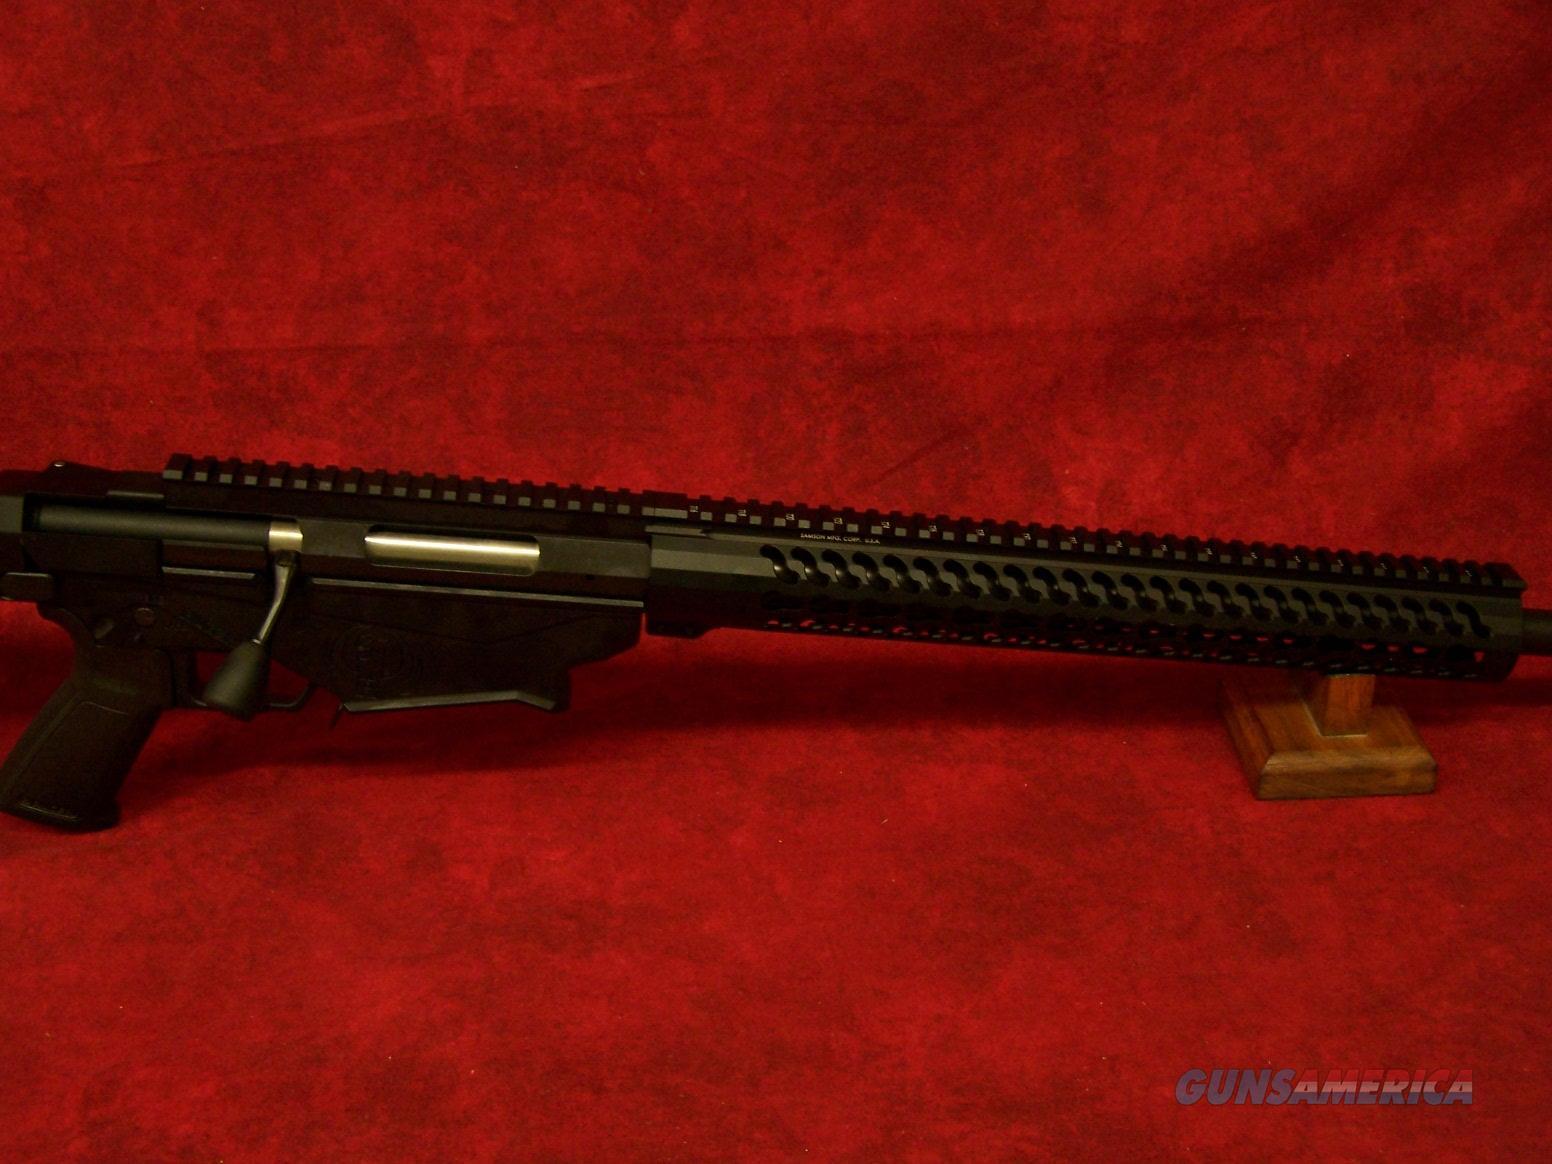 "Ruger Precision Bolt Action Rifle 6.5 Creedmoor 24"" Threaded Barrel 5R Rifling Samson Keymod Handguard Precision MSR Folding Adjustable Stock(18005)  Guns > Rifles > Ruger Rifles > Model 77"